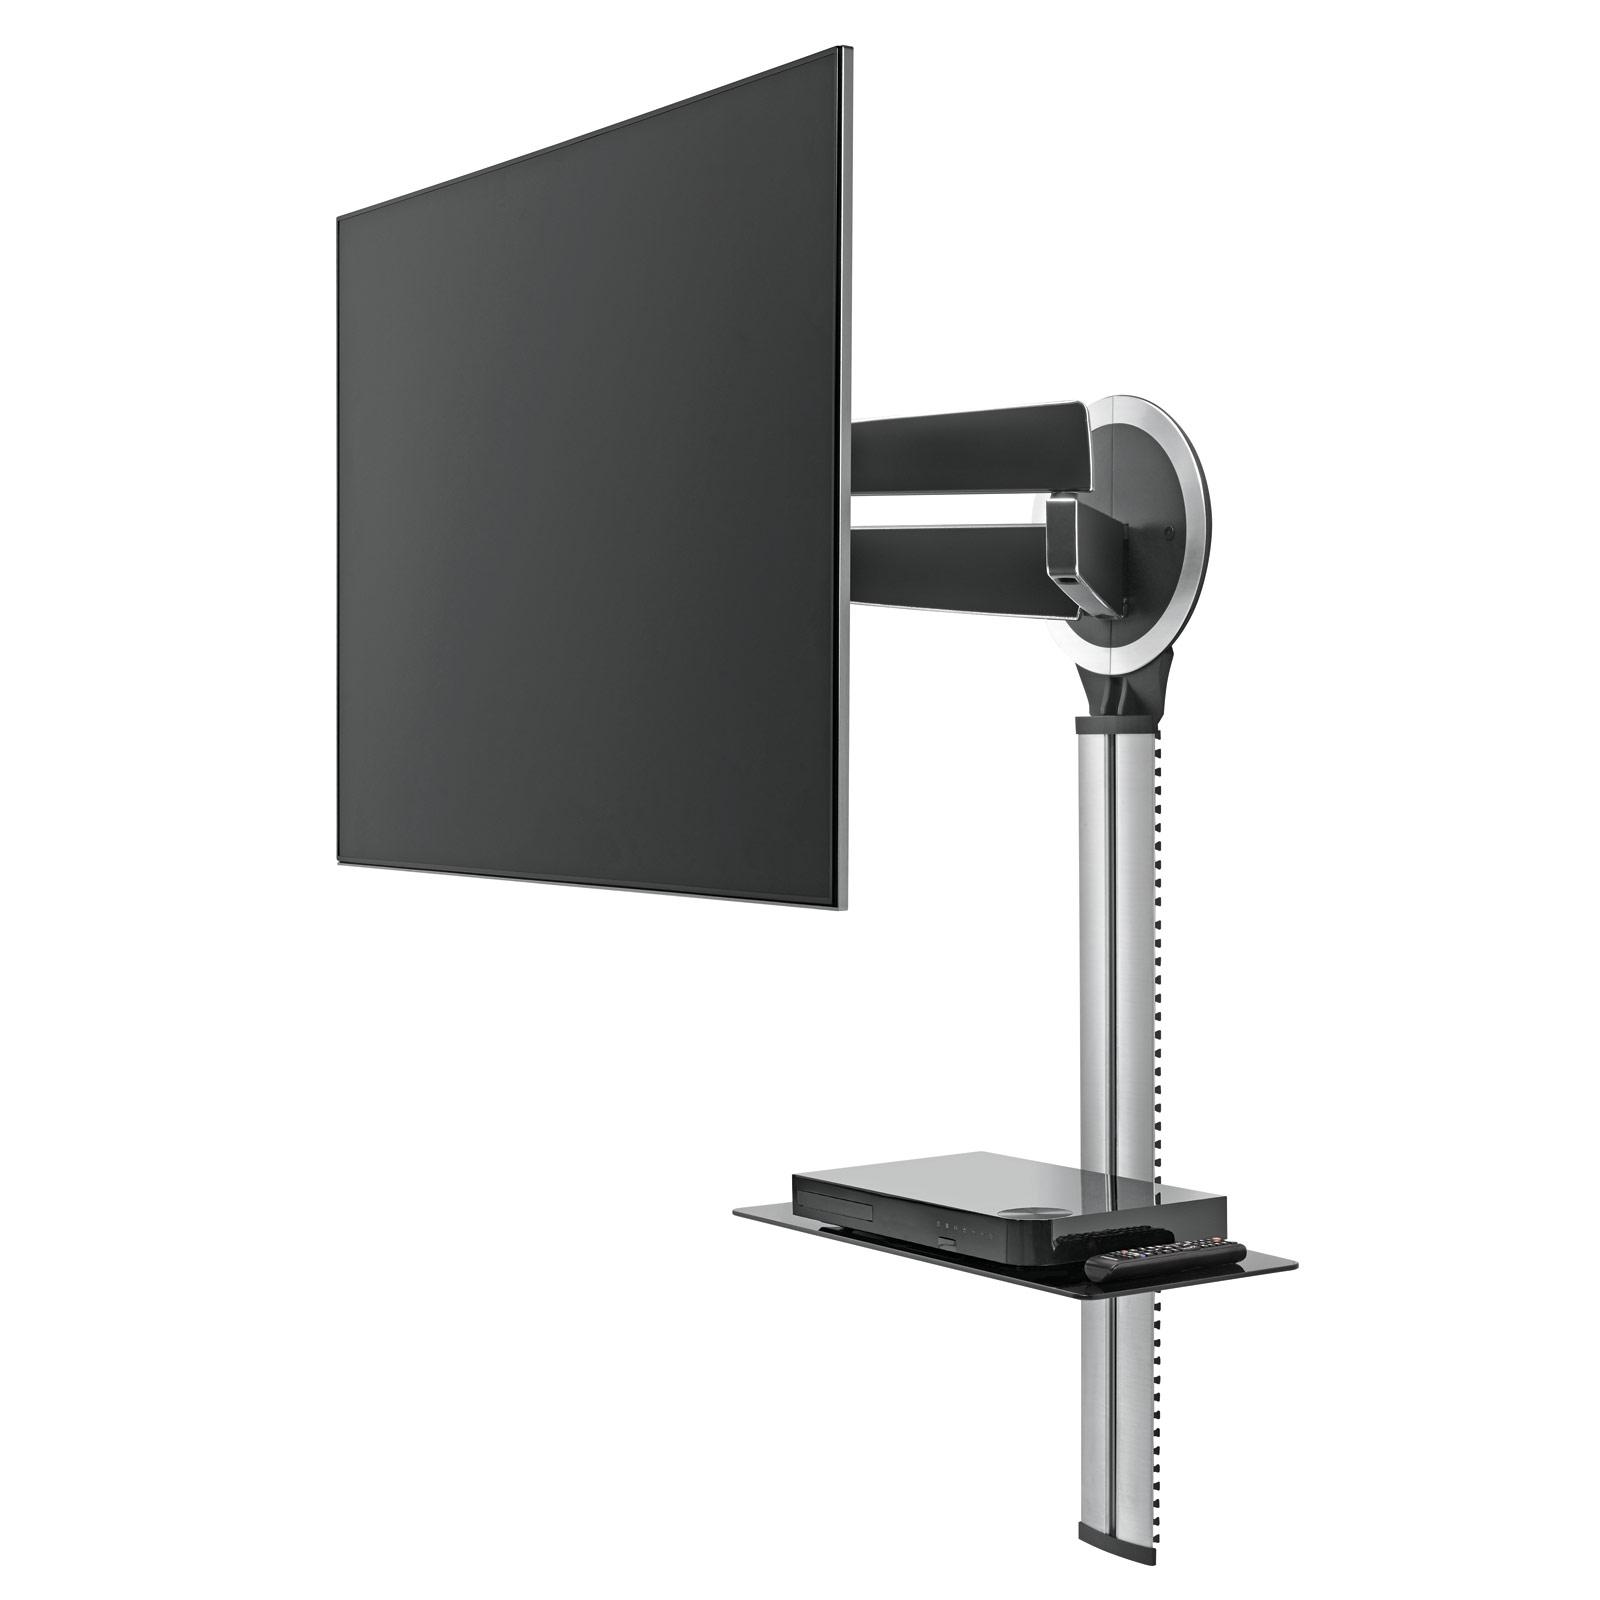 vogel 39 s next 7825 next 7825 achat vente support mural tv sur. Black Bedroom Furniture Sets. Home Design Ideas